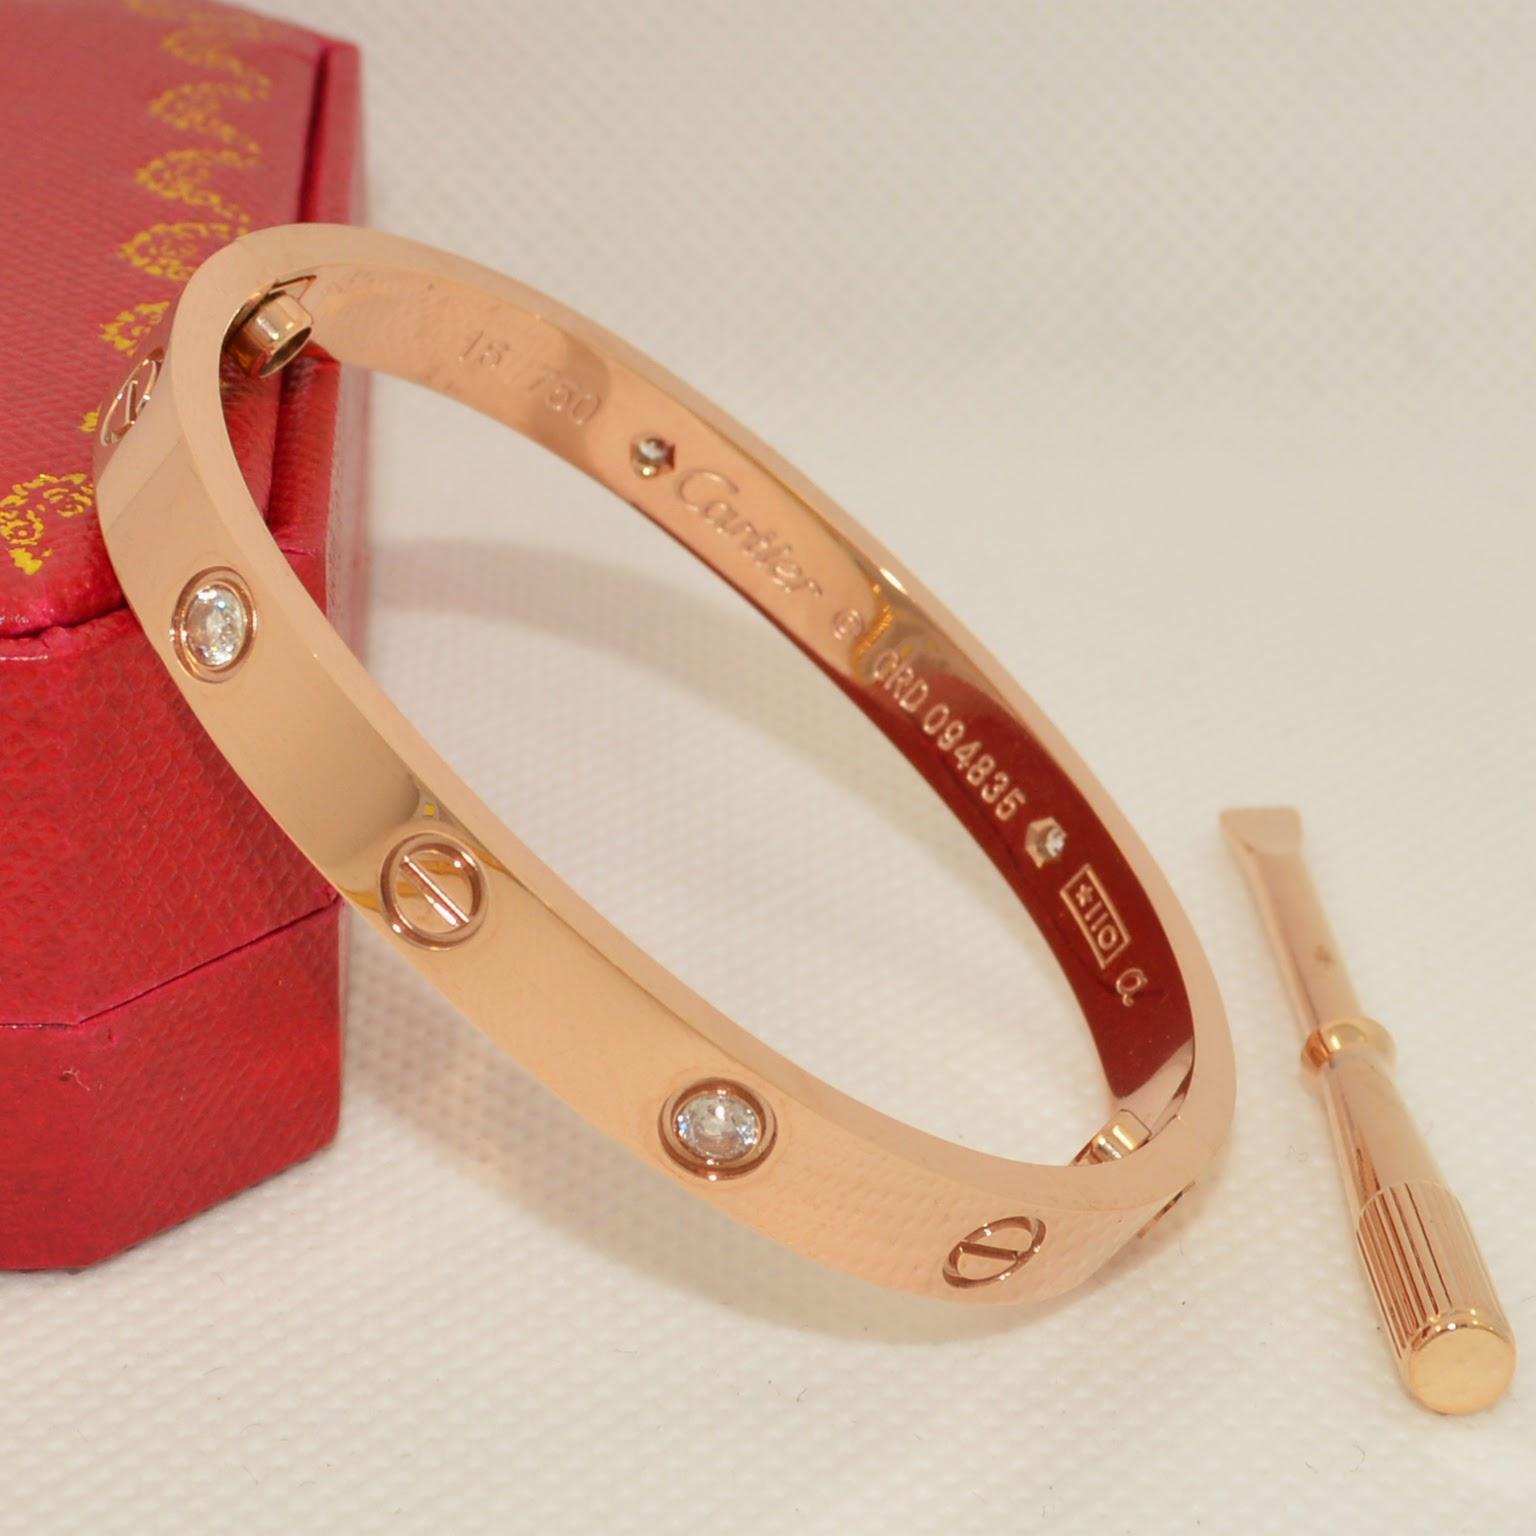 Apple fashion: Cartier love bracelet replica Best for ...  Apple fashion: ...